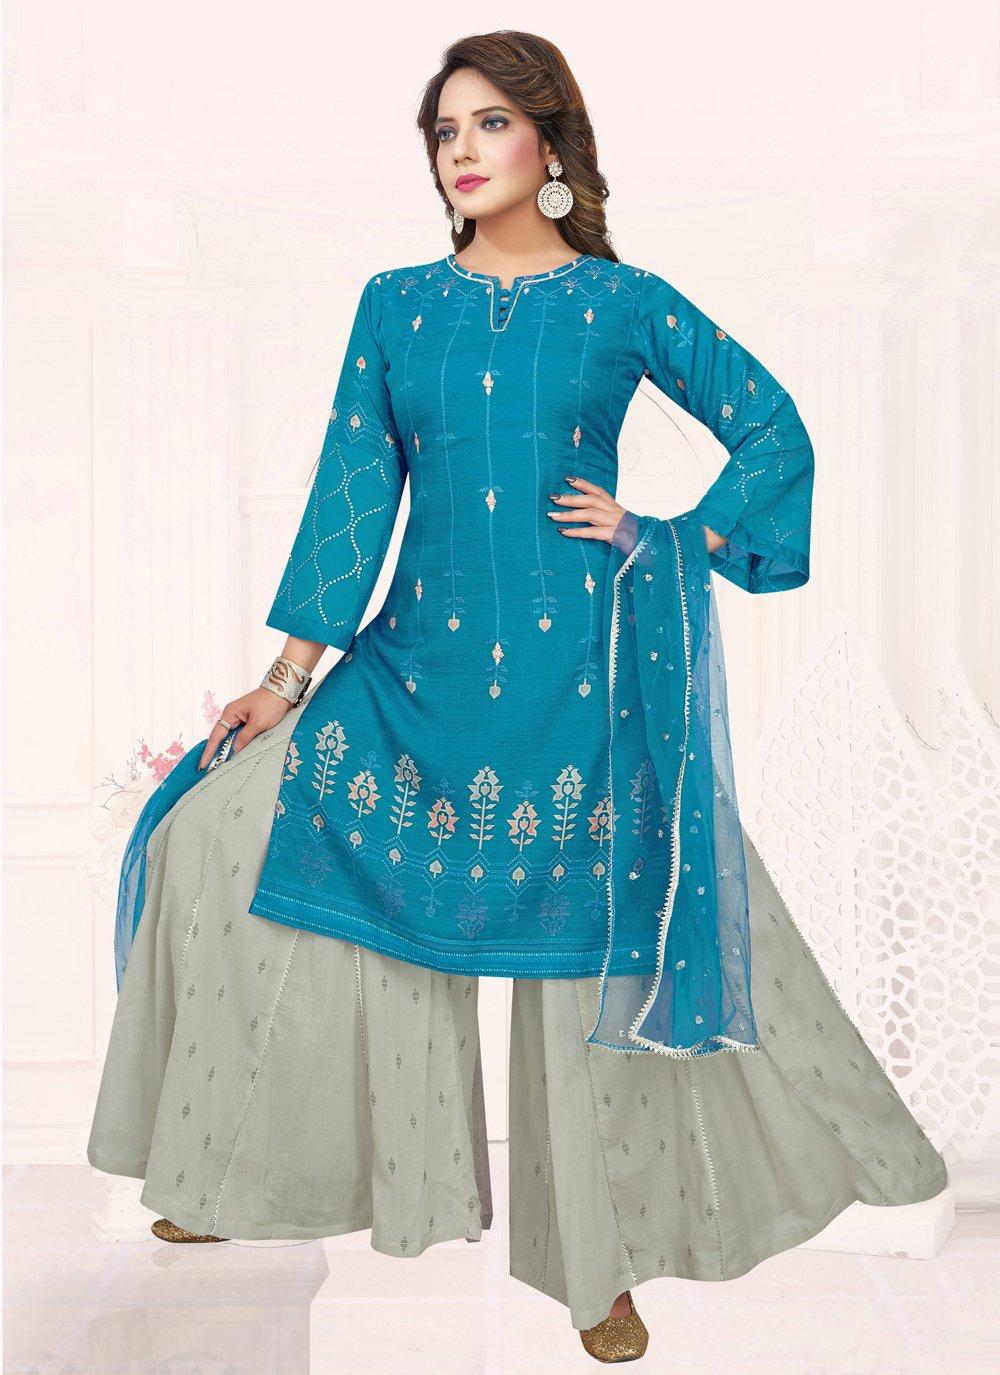 Blue Cotton Ceremonial Bollywood Salwar Kameez